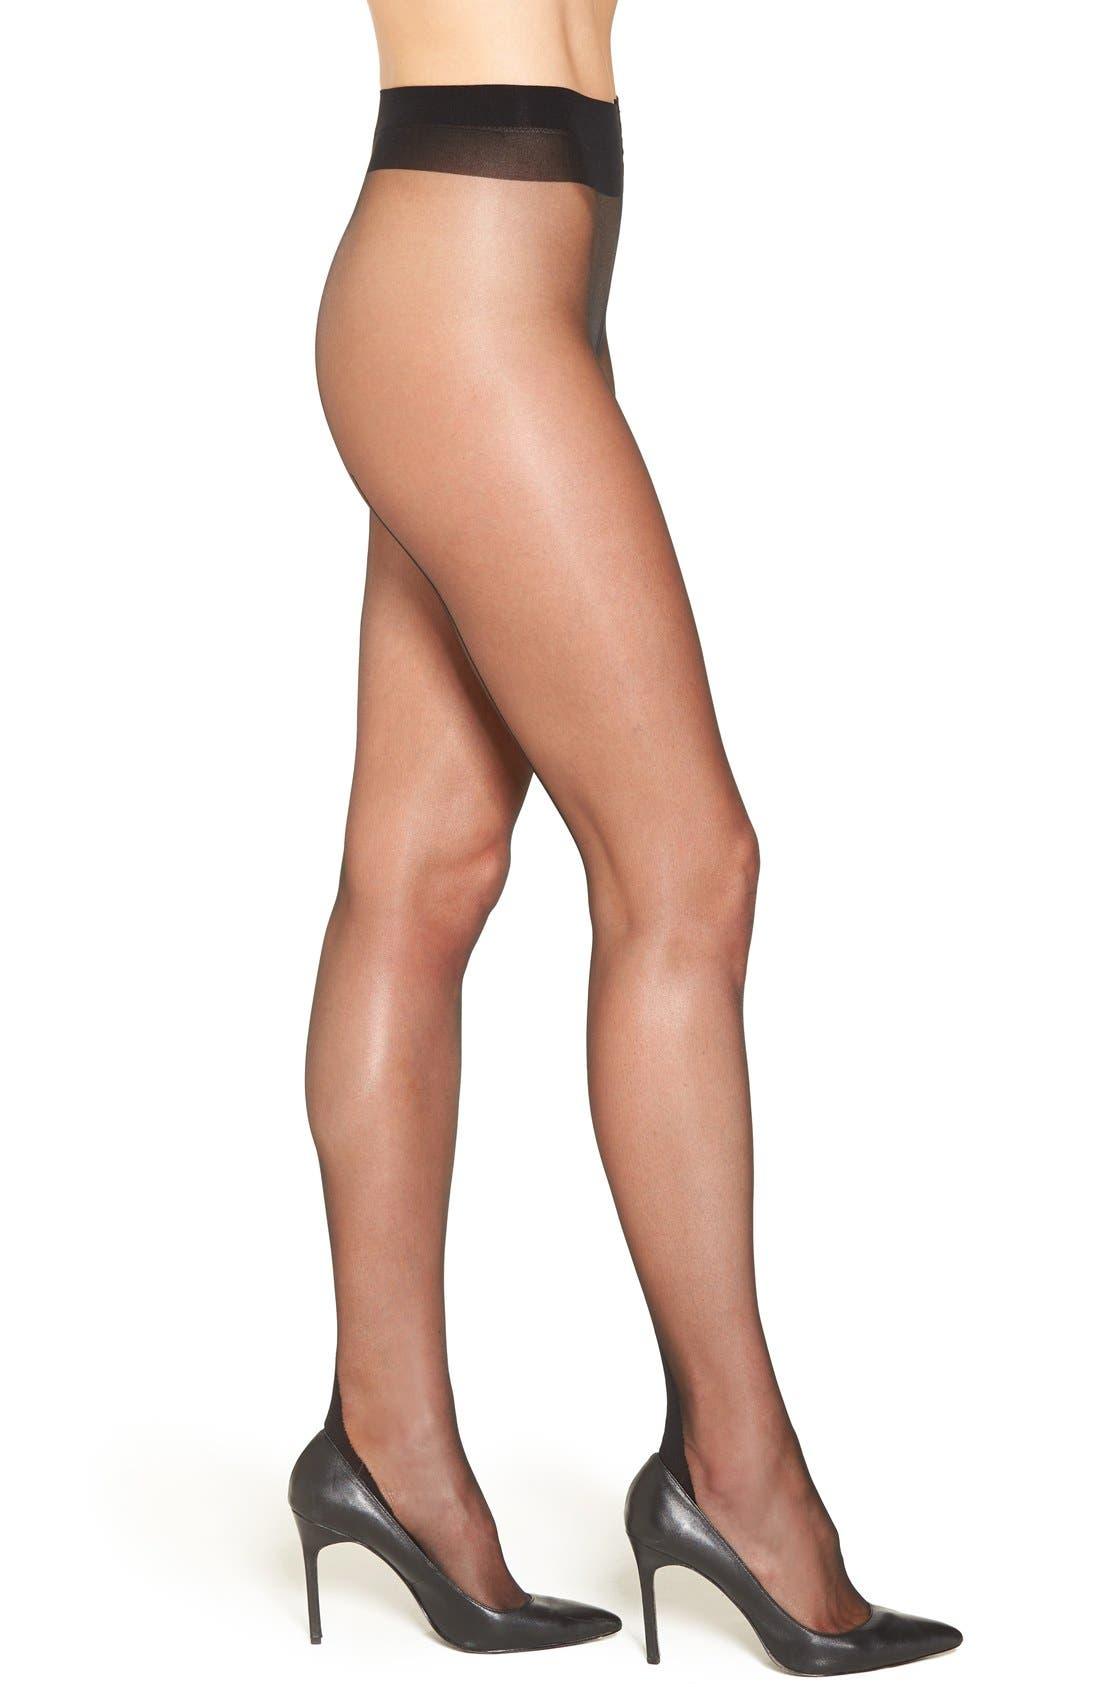 Alternate Image 1 Selected - Falke 'High Heel' Back Seam Pantyhose